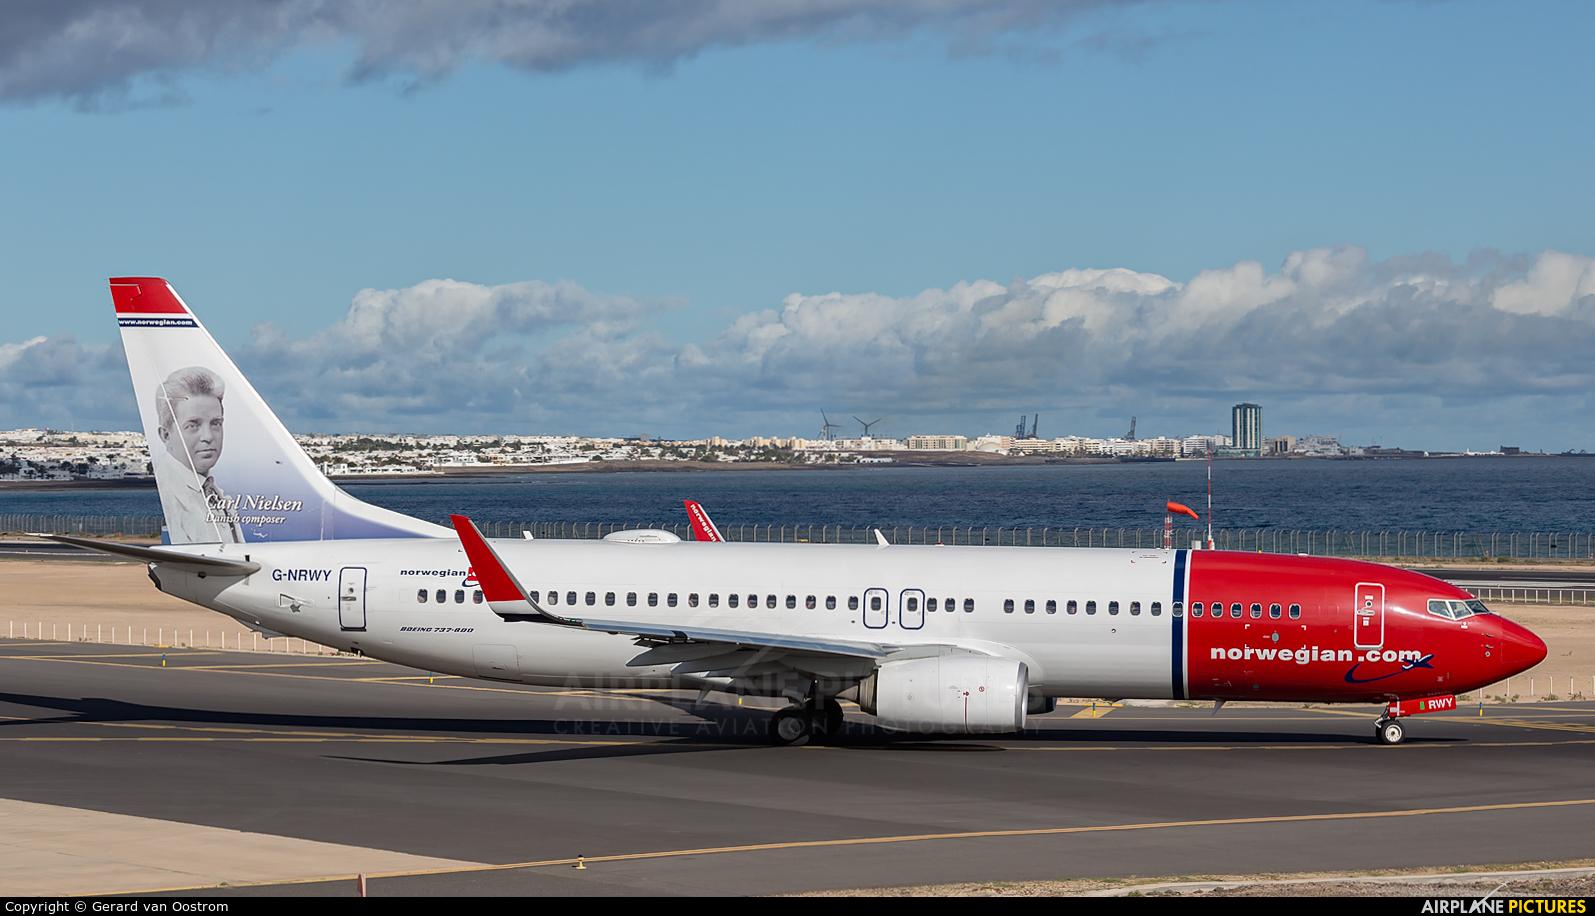 Norwegian Air Shuttle G-NRWY aircraft at Lanzarote - Arrecife